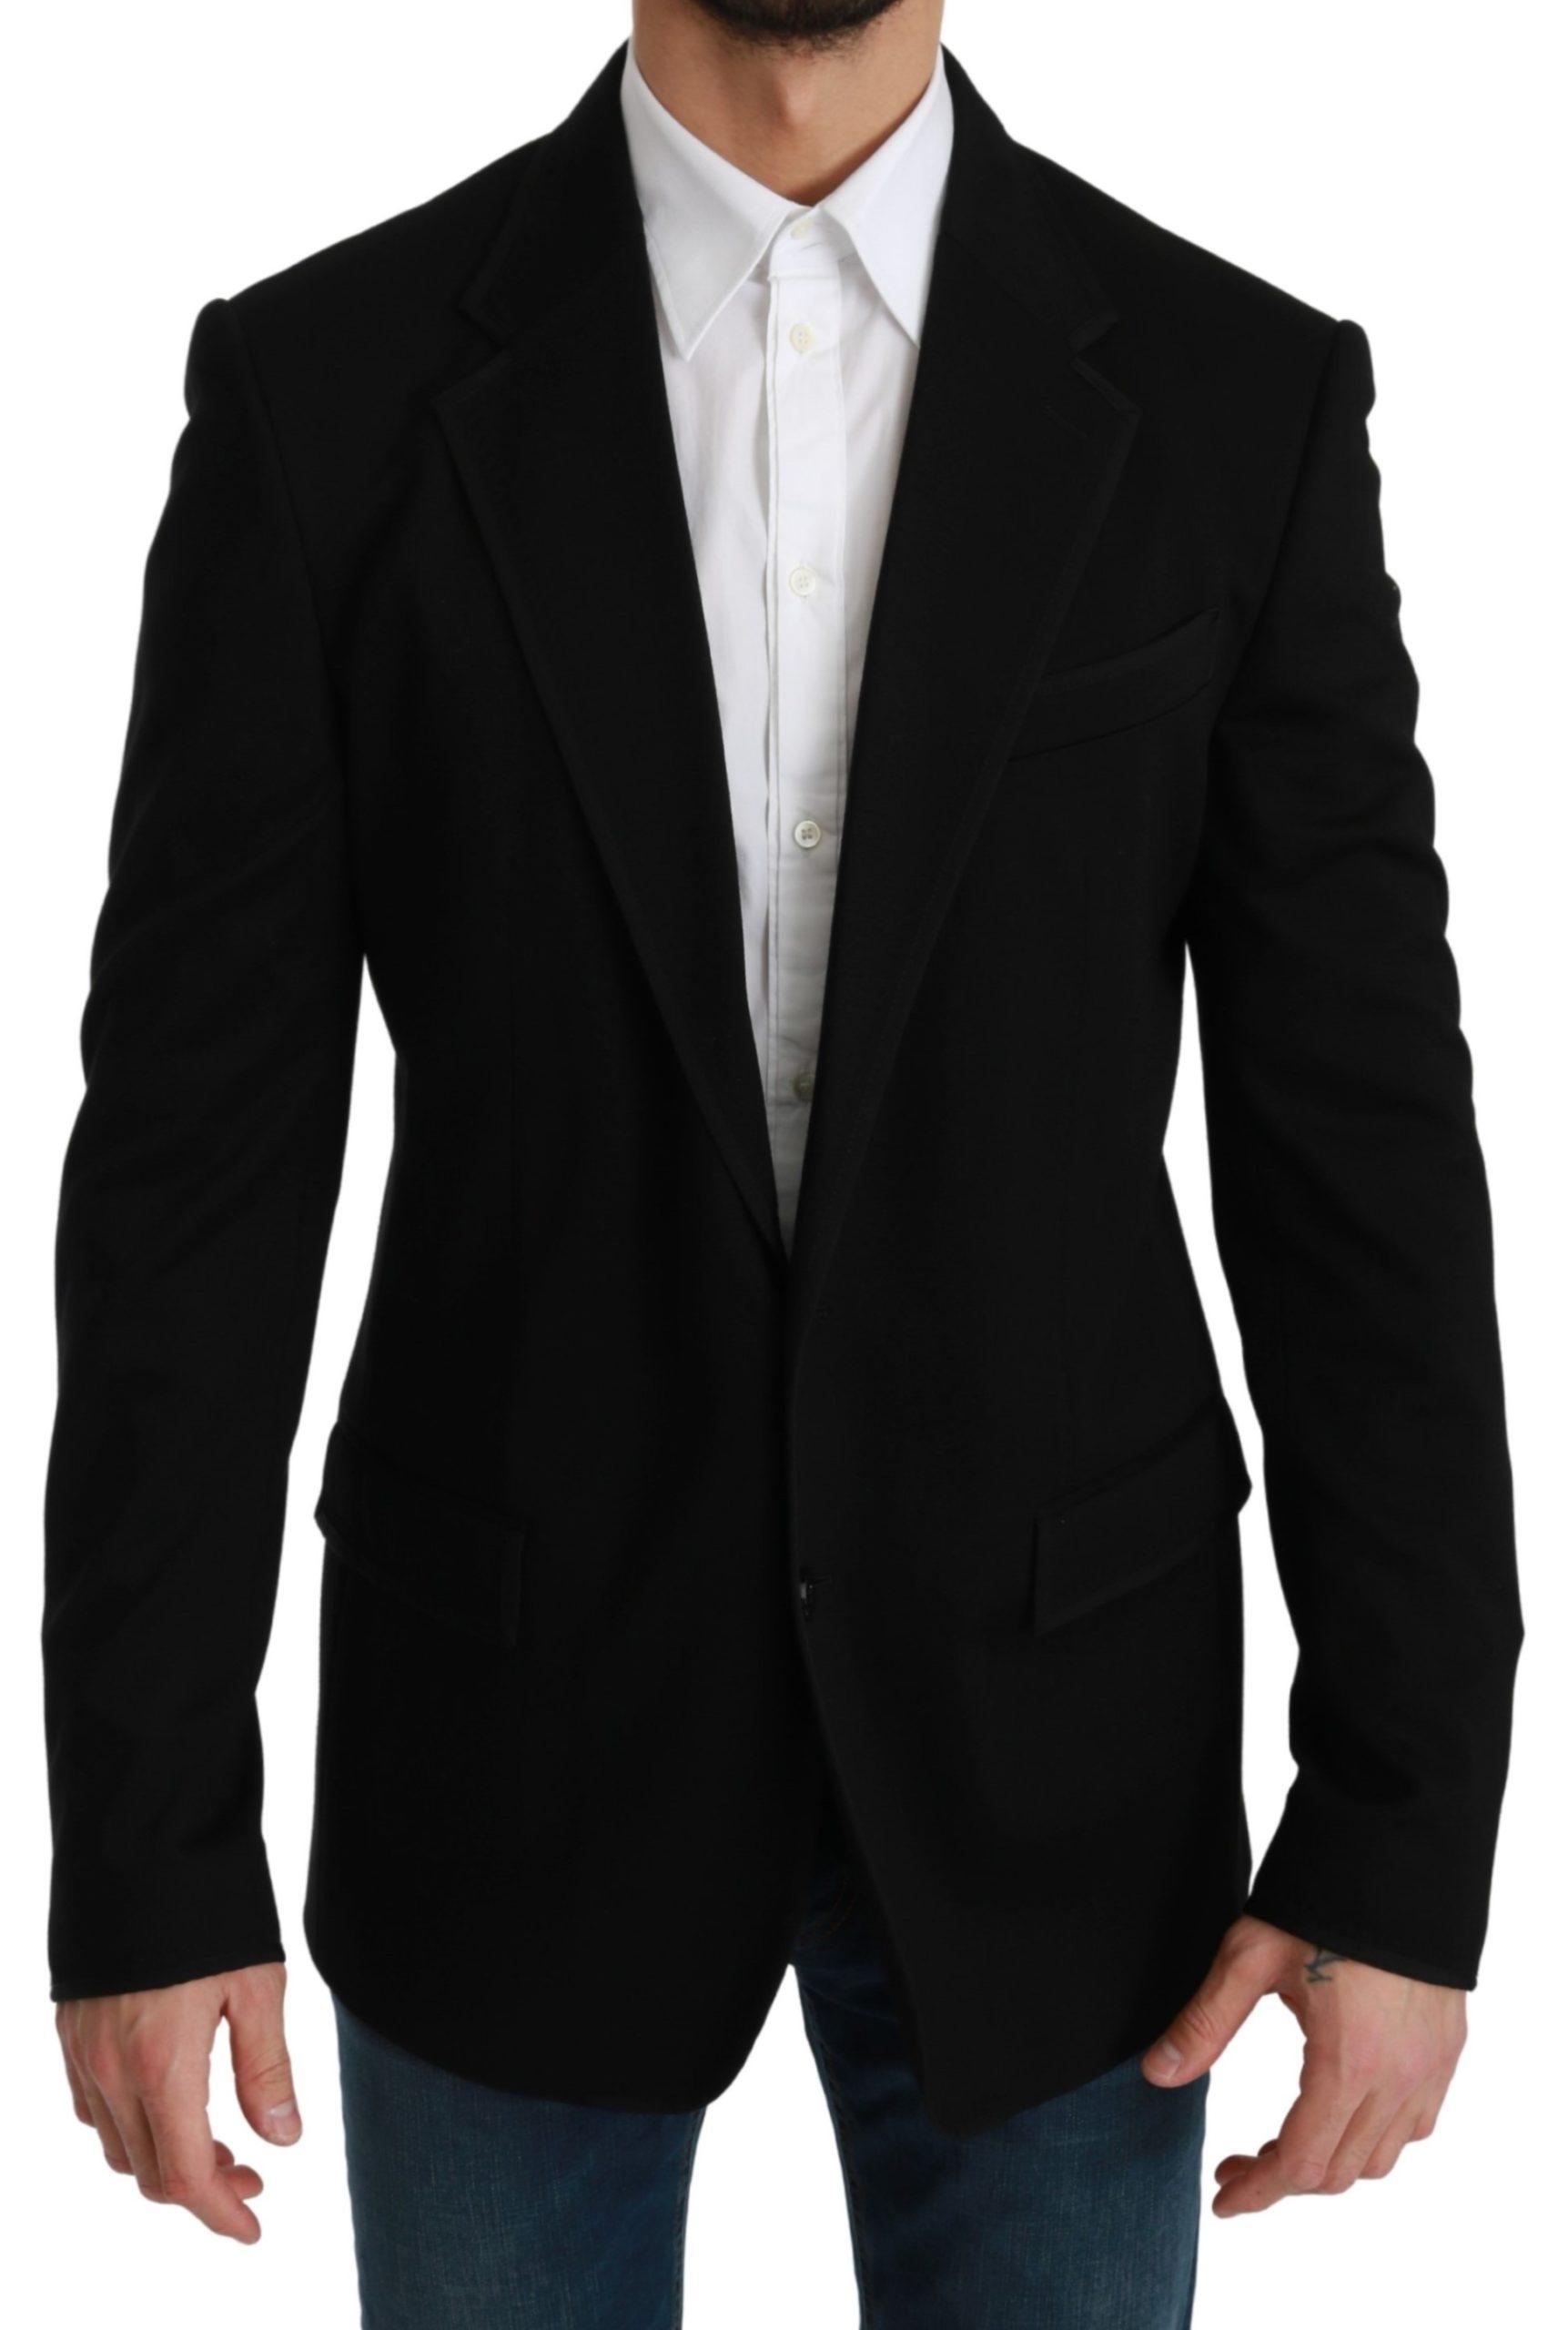 Dolce & Gabbana Men's Formal Slim Fit Blazer Black KOS1759 - IT52   L